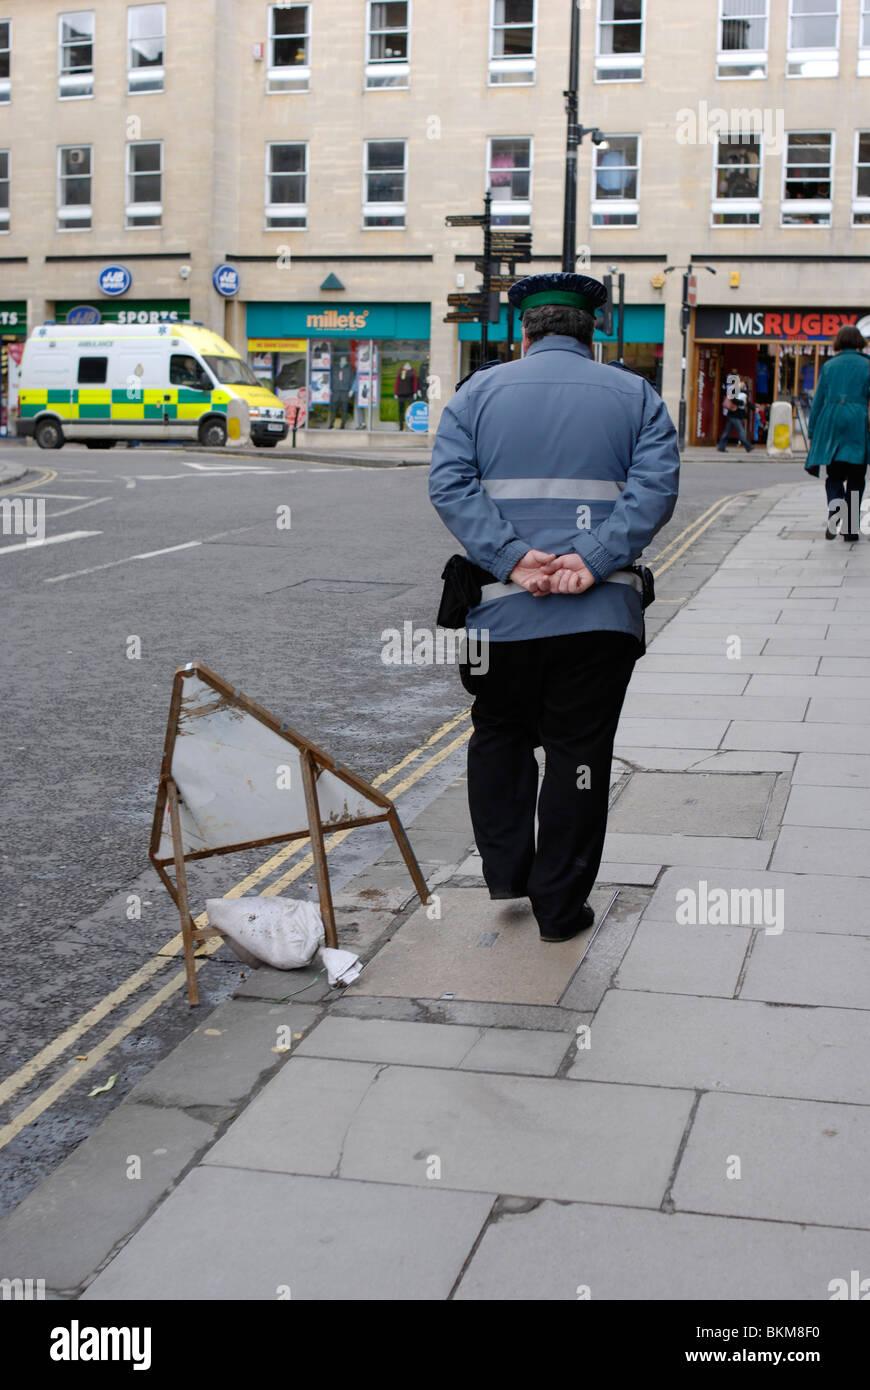 Traffic warden patrolling in Bath city centre. - Stock Image